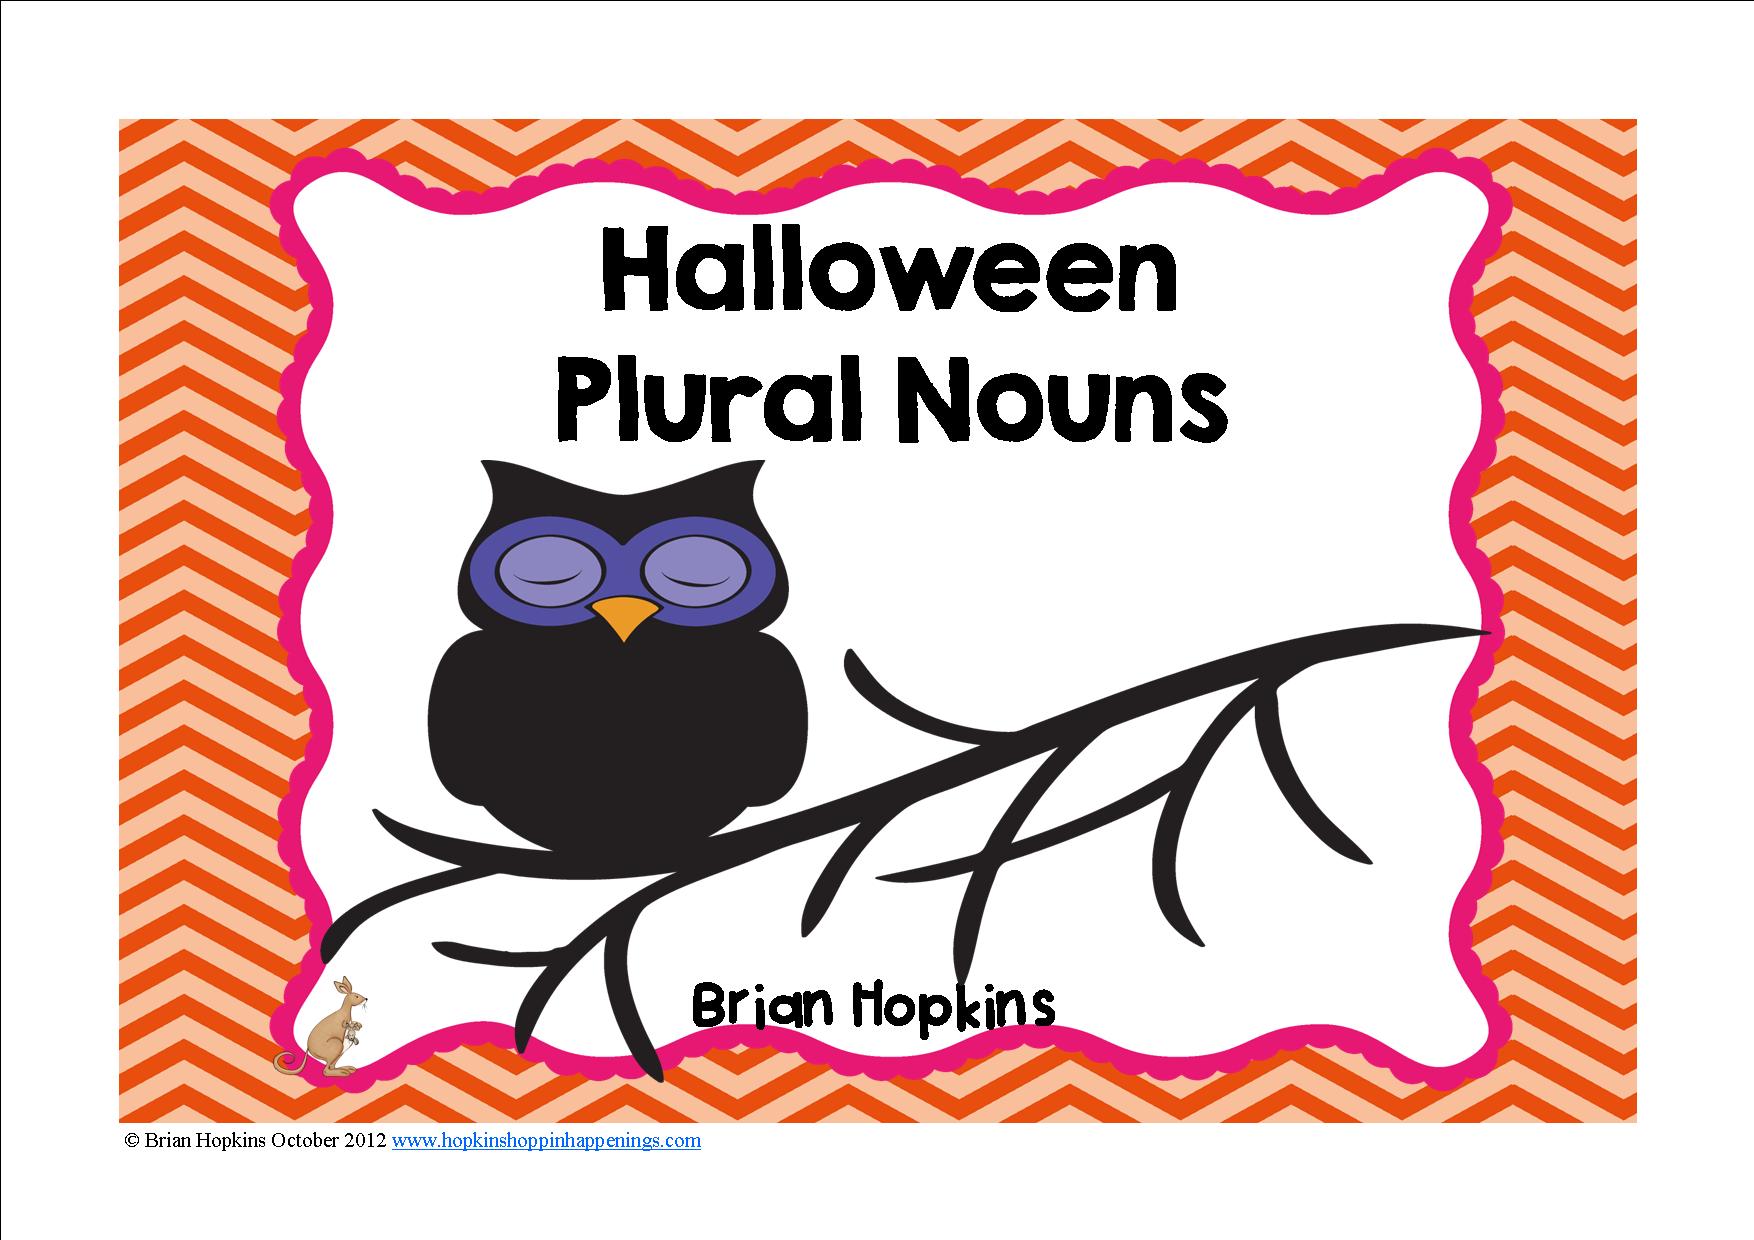 Halloween Plural Nouns